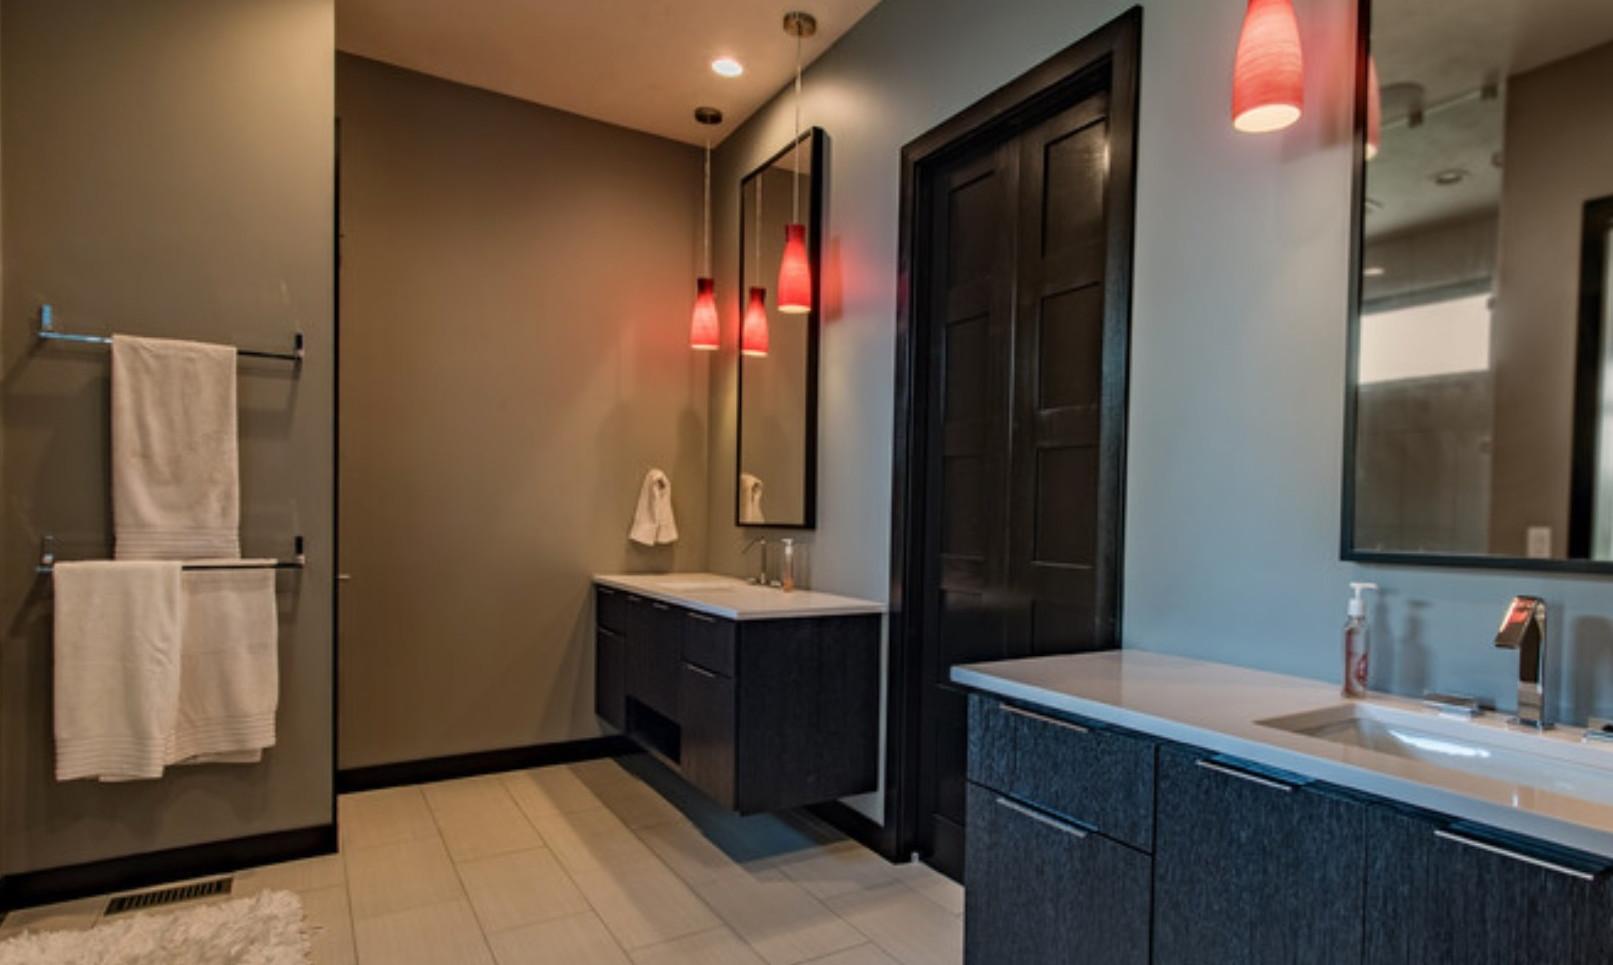 Bathroom sample 3